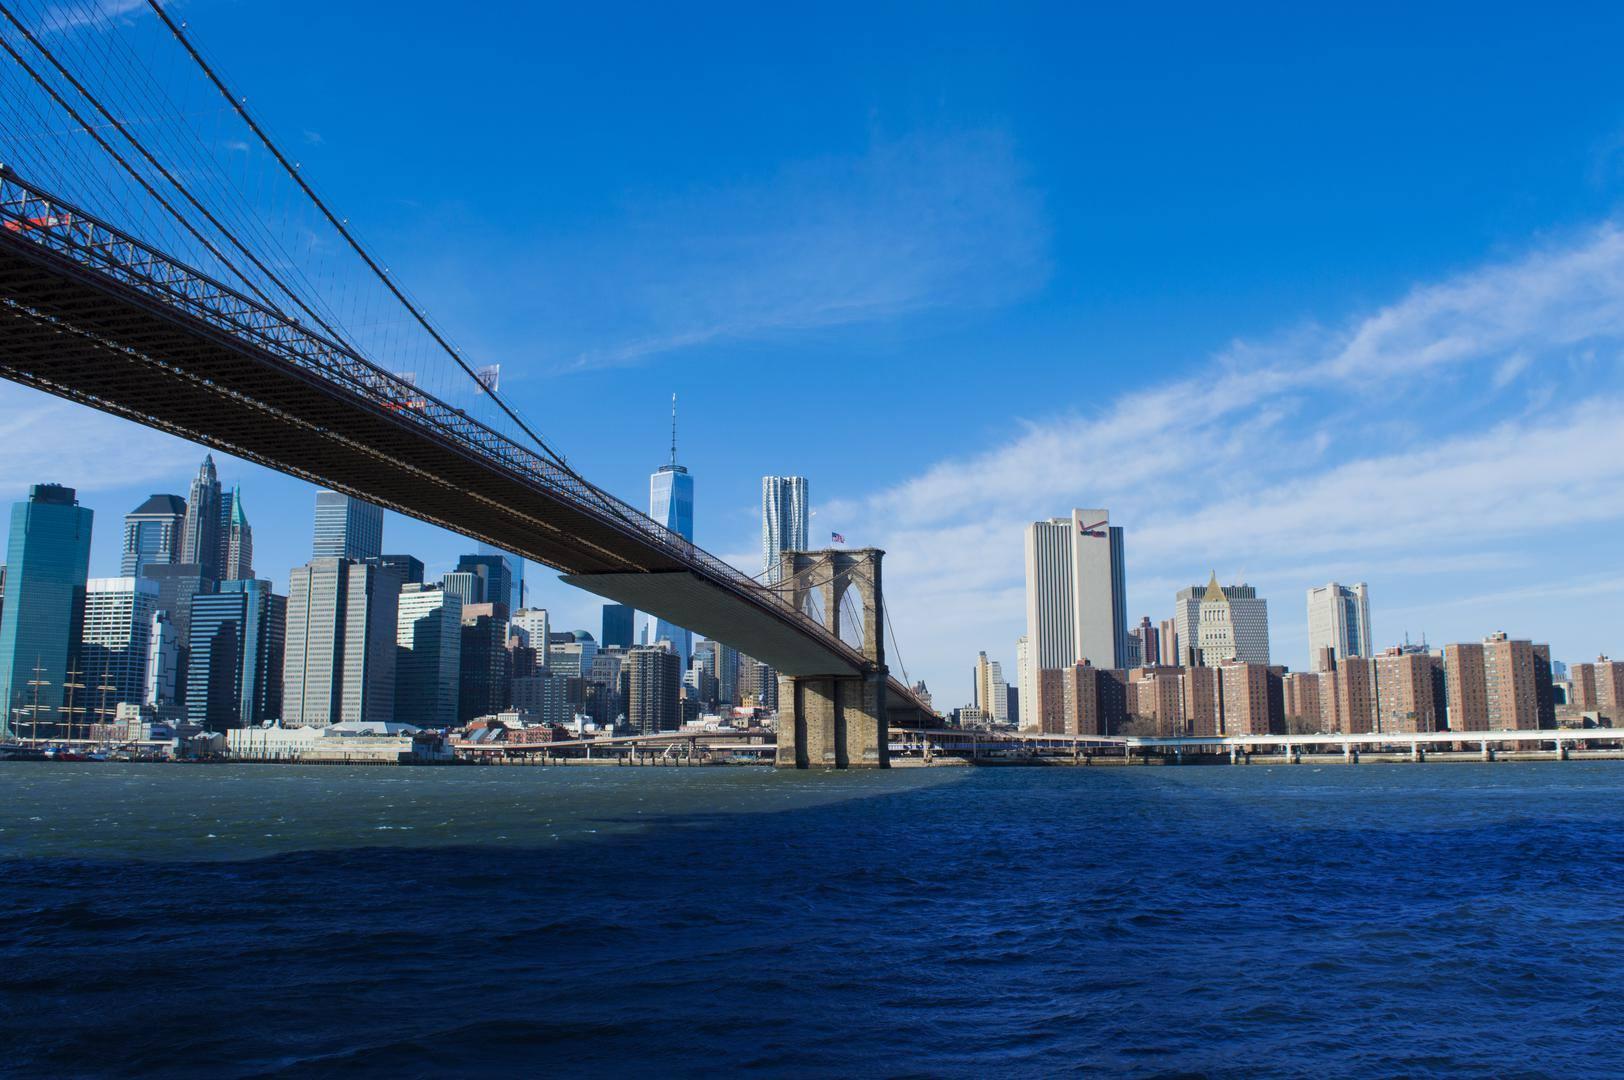 new york brooklyn bridge manhattan skyline river